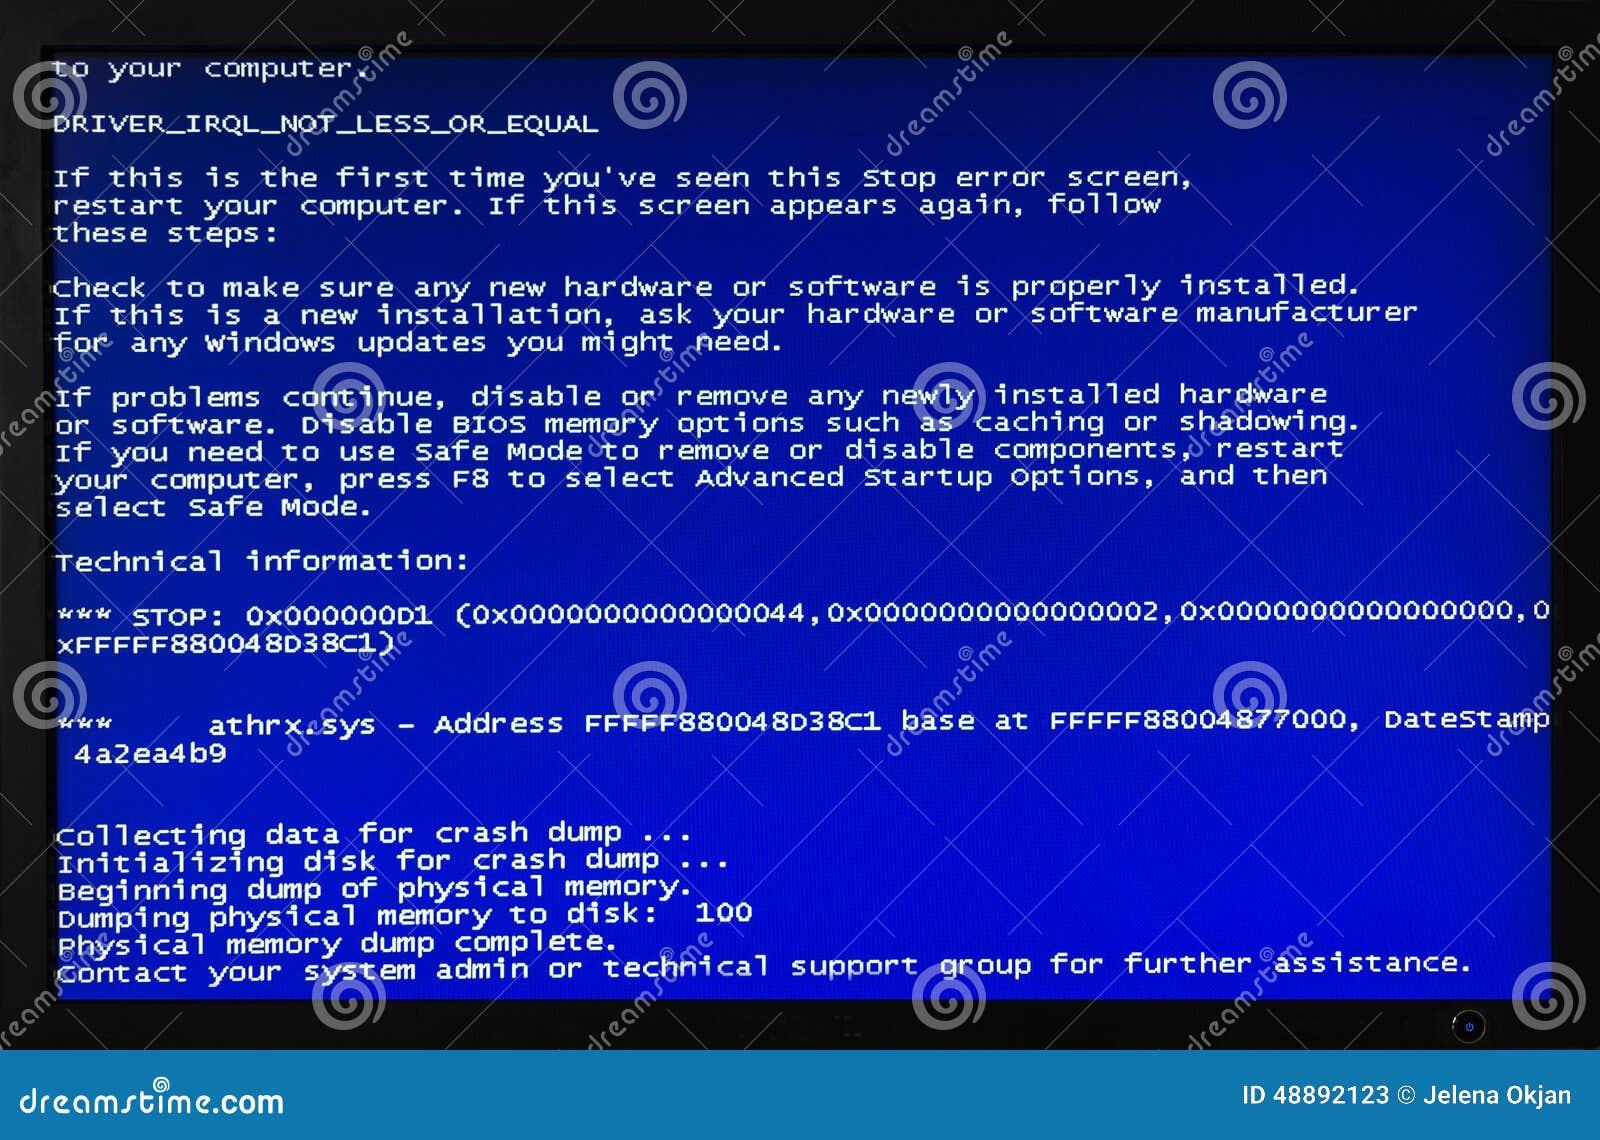 голубой экран компьютера